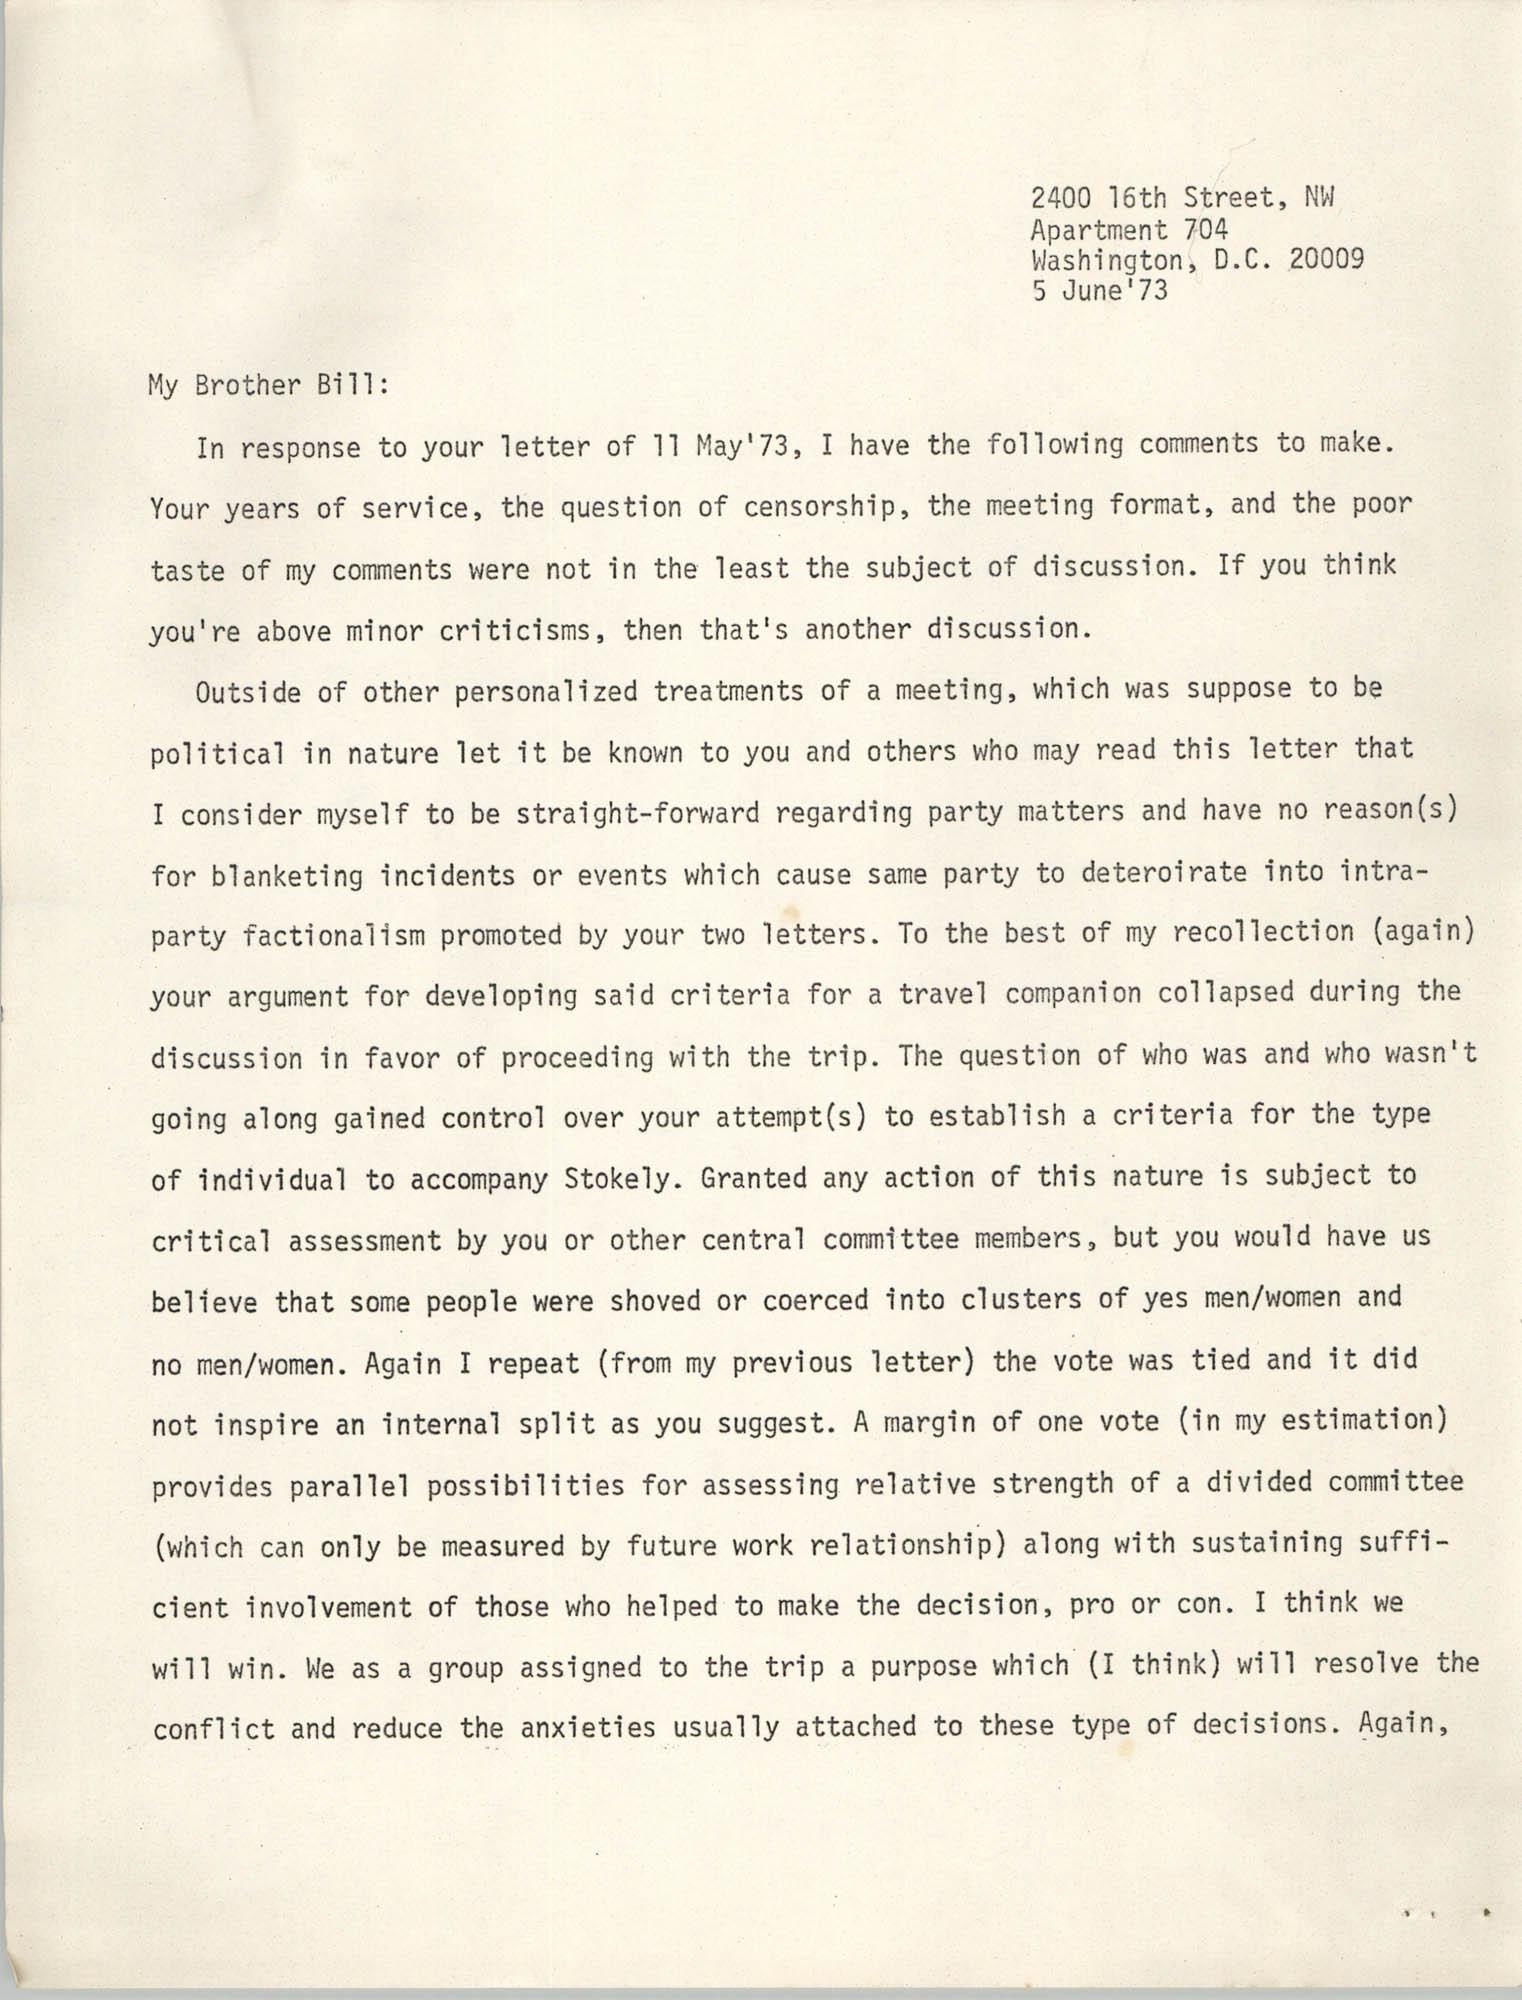 Letter from Jan Bailey, June 5, 1973